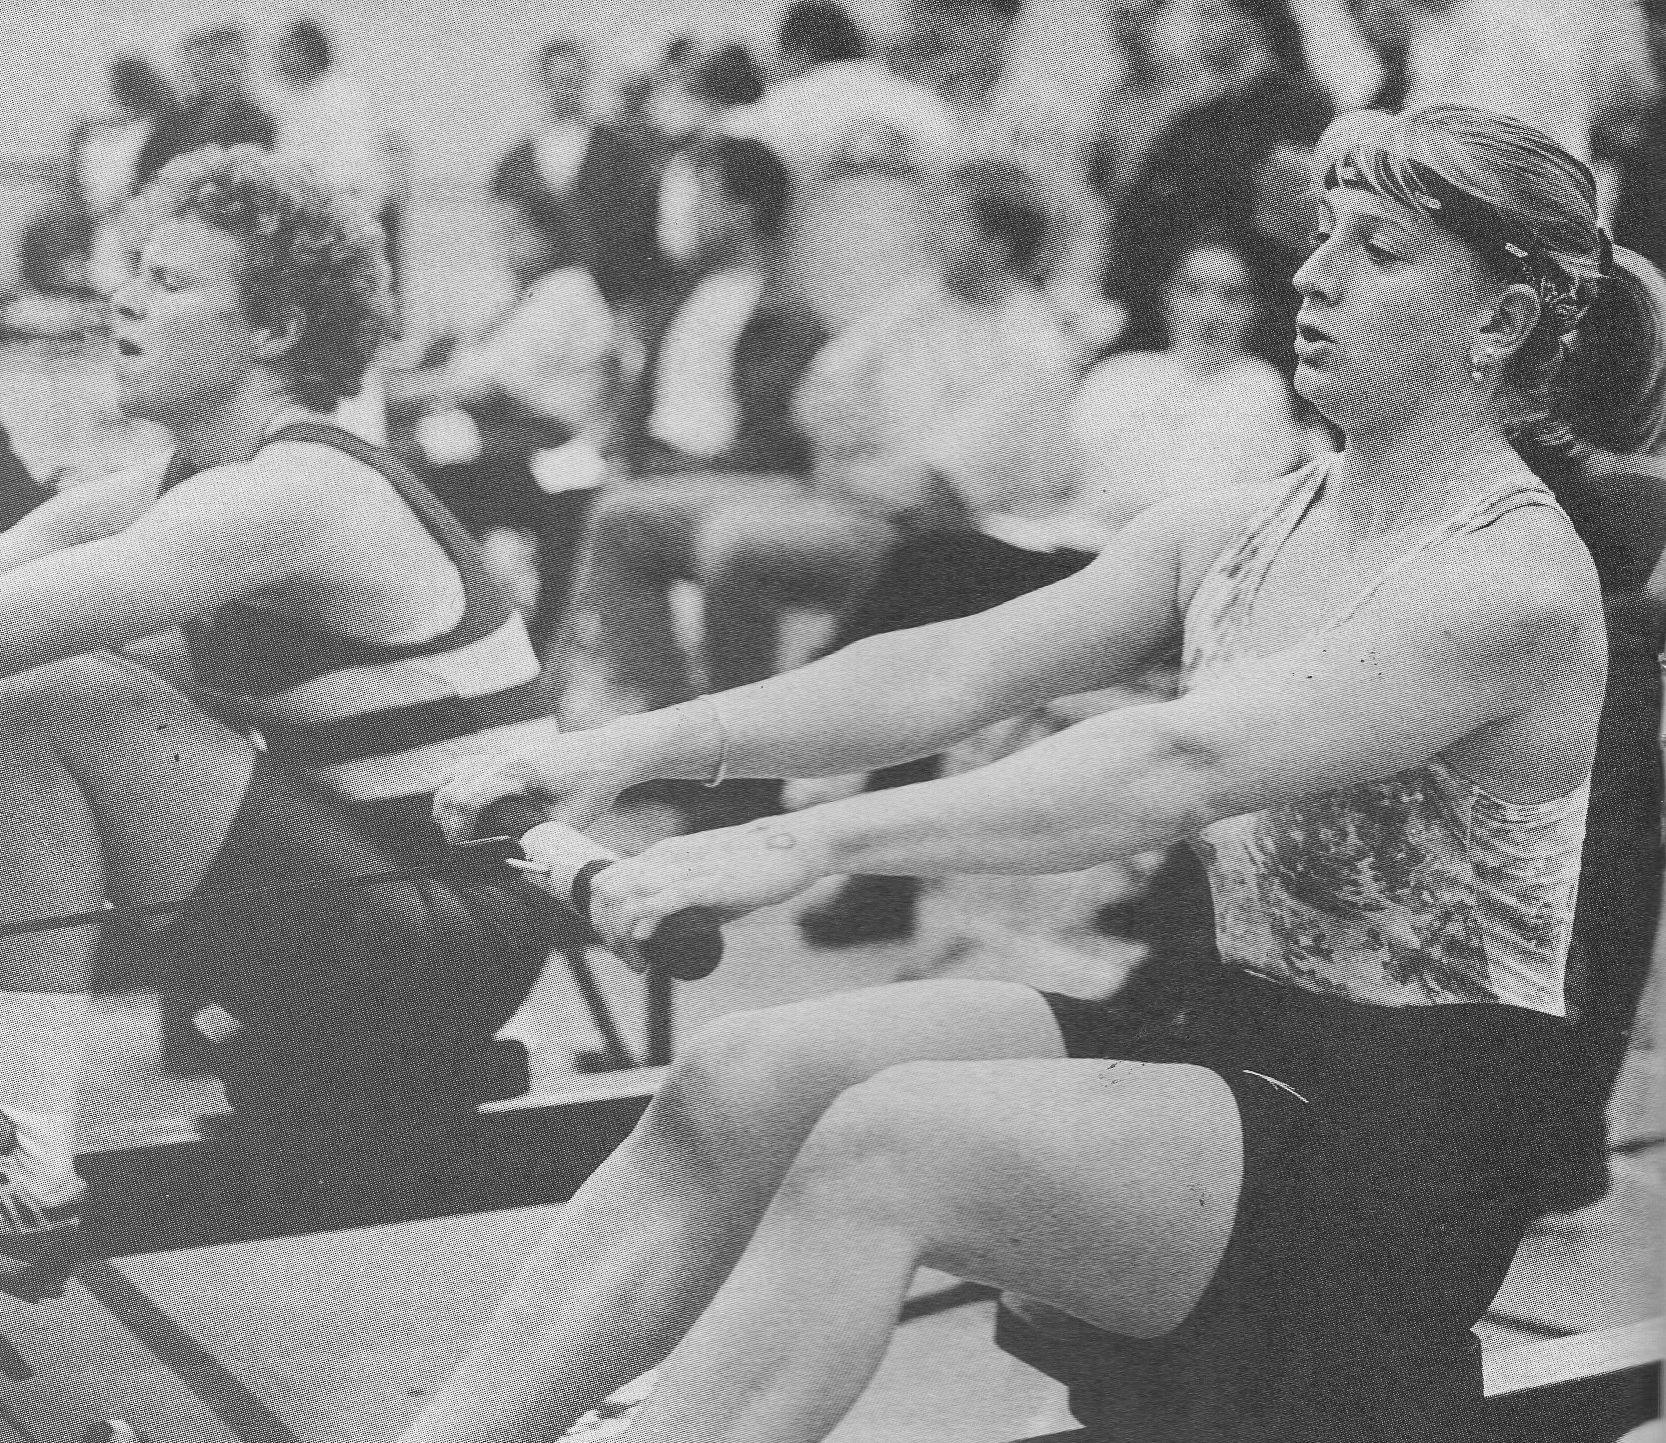 b/w photo of lightweight women on ergo